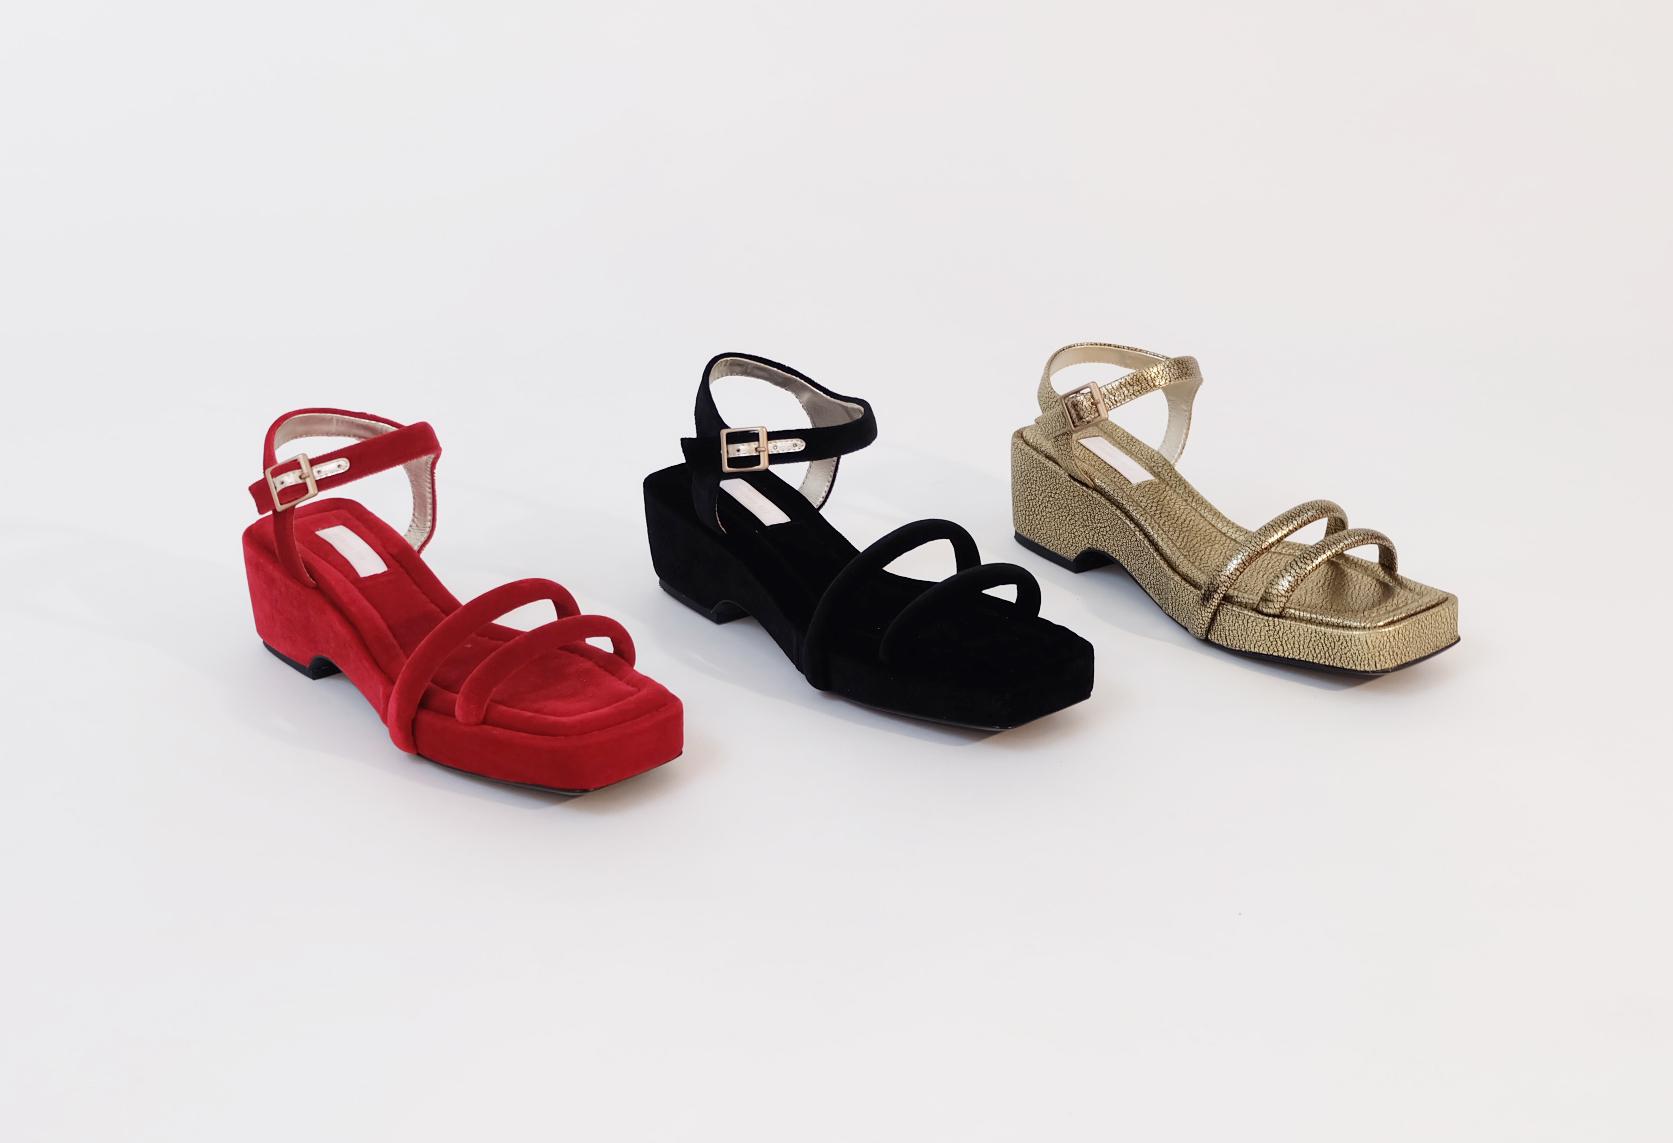 Suzanne Rae sandals.